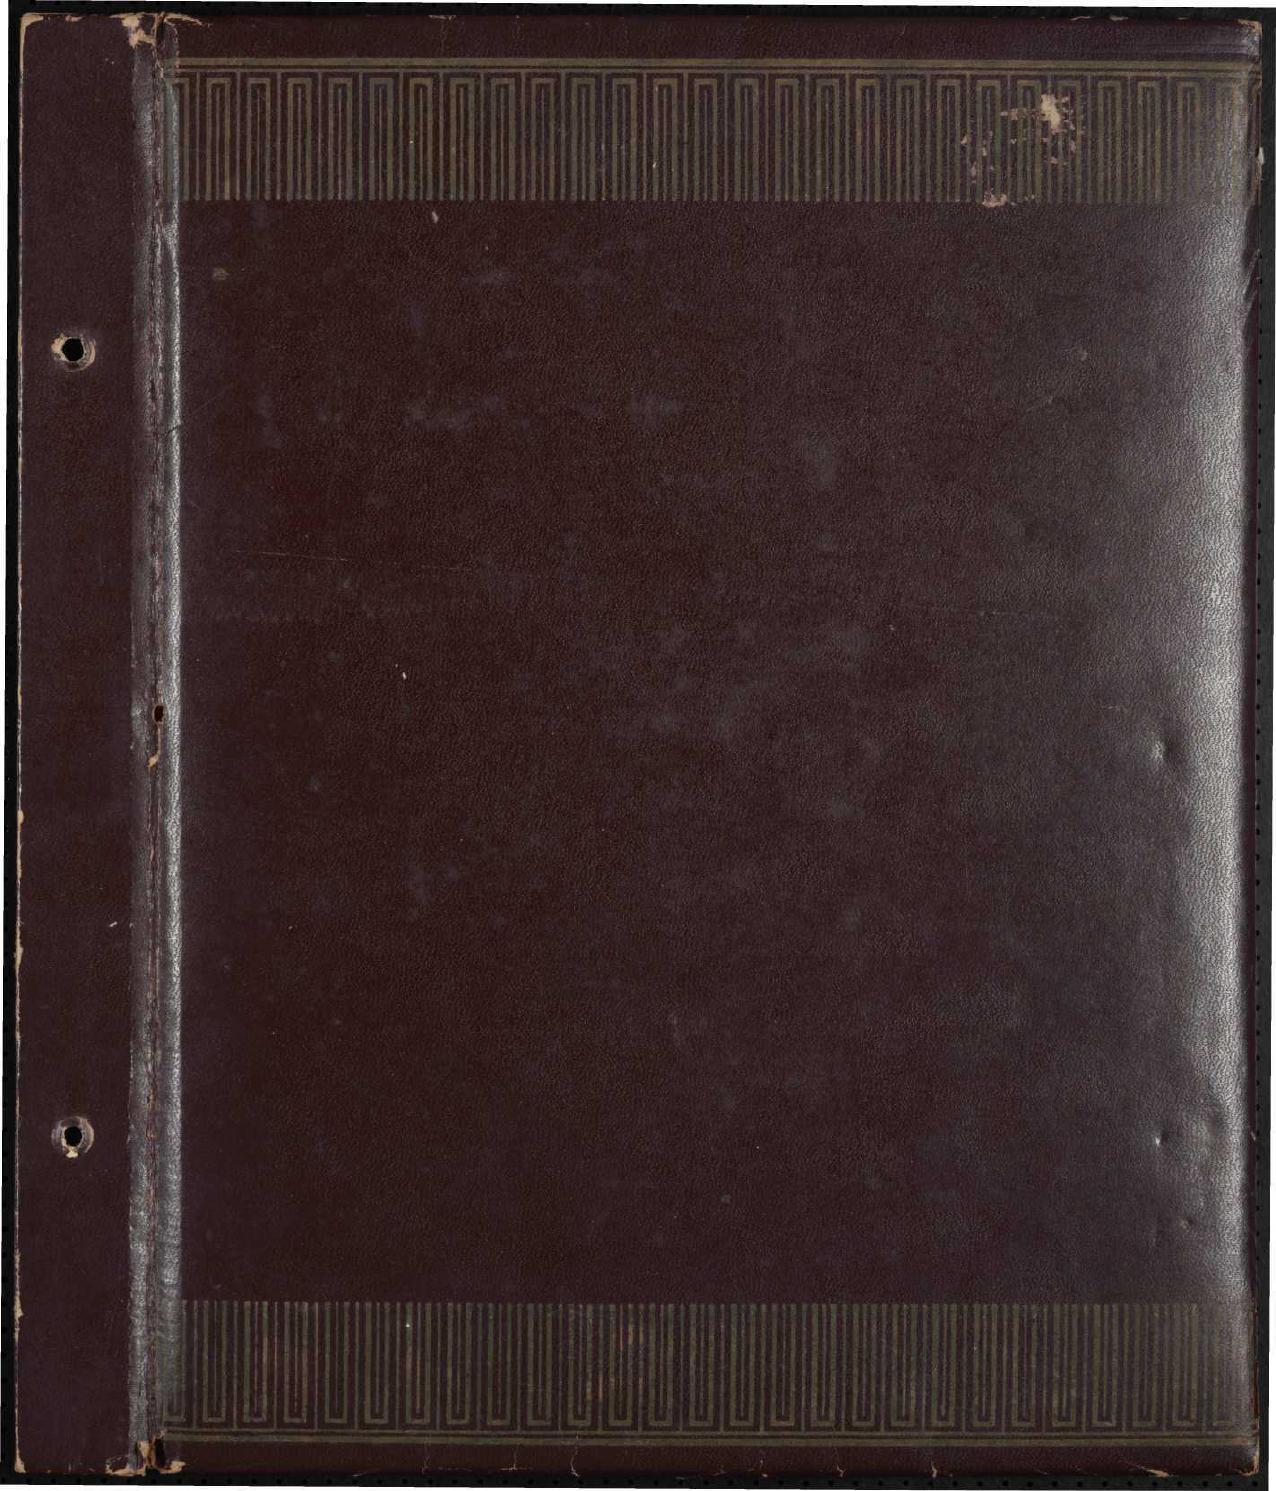 be5230f9ac8 Fred T Morgan Scrapbook 03 001 by Julie Hawks - issuu